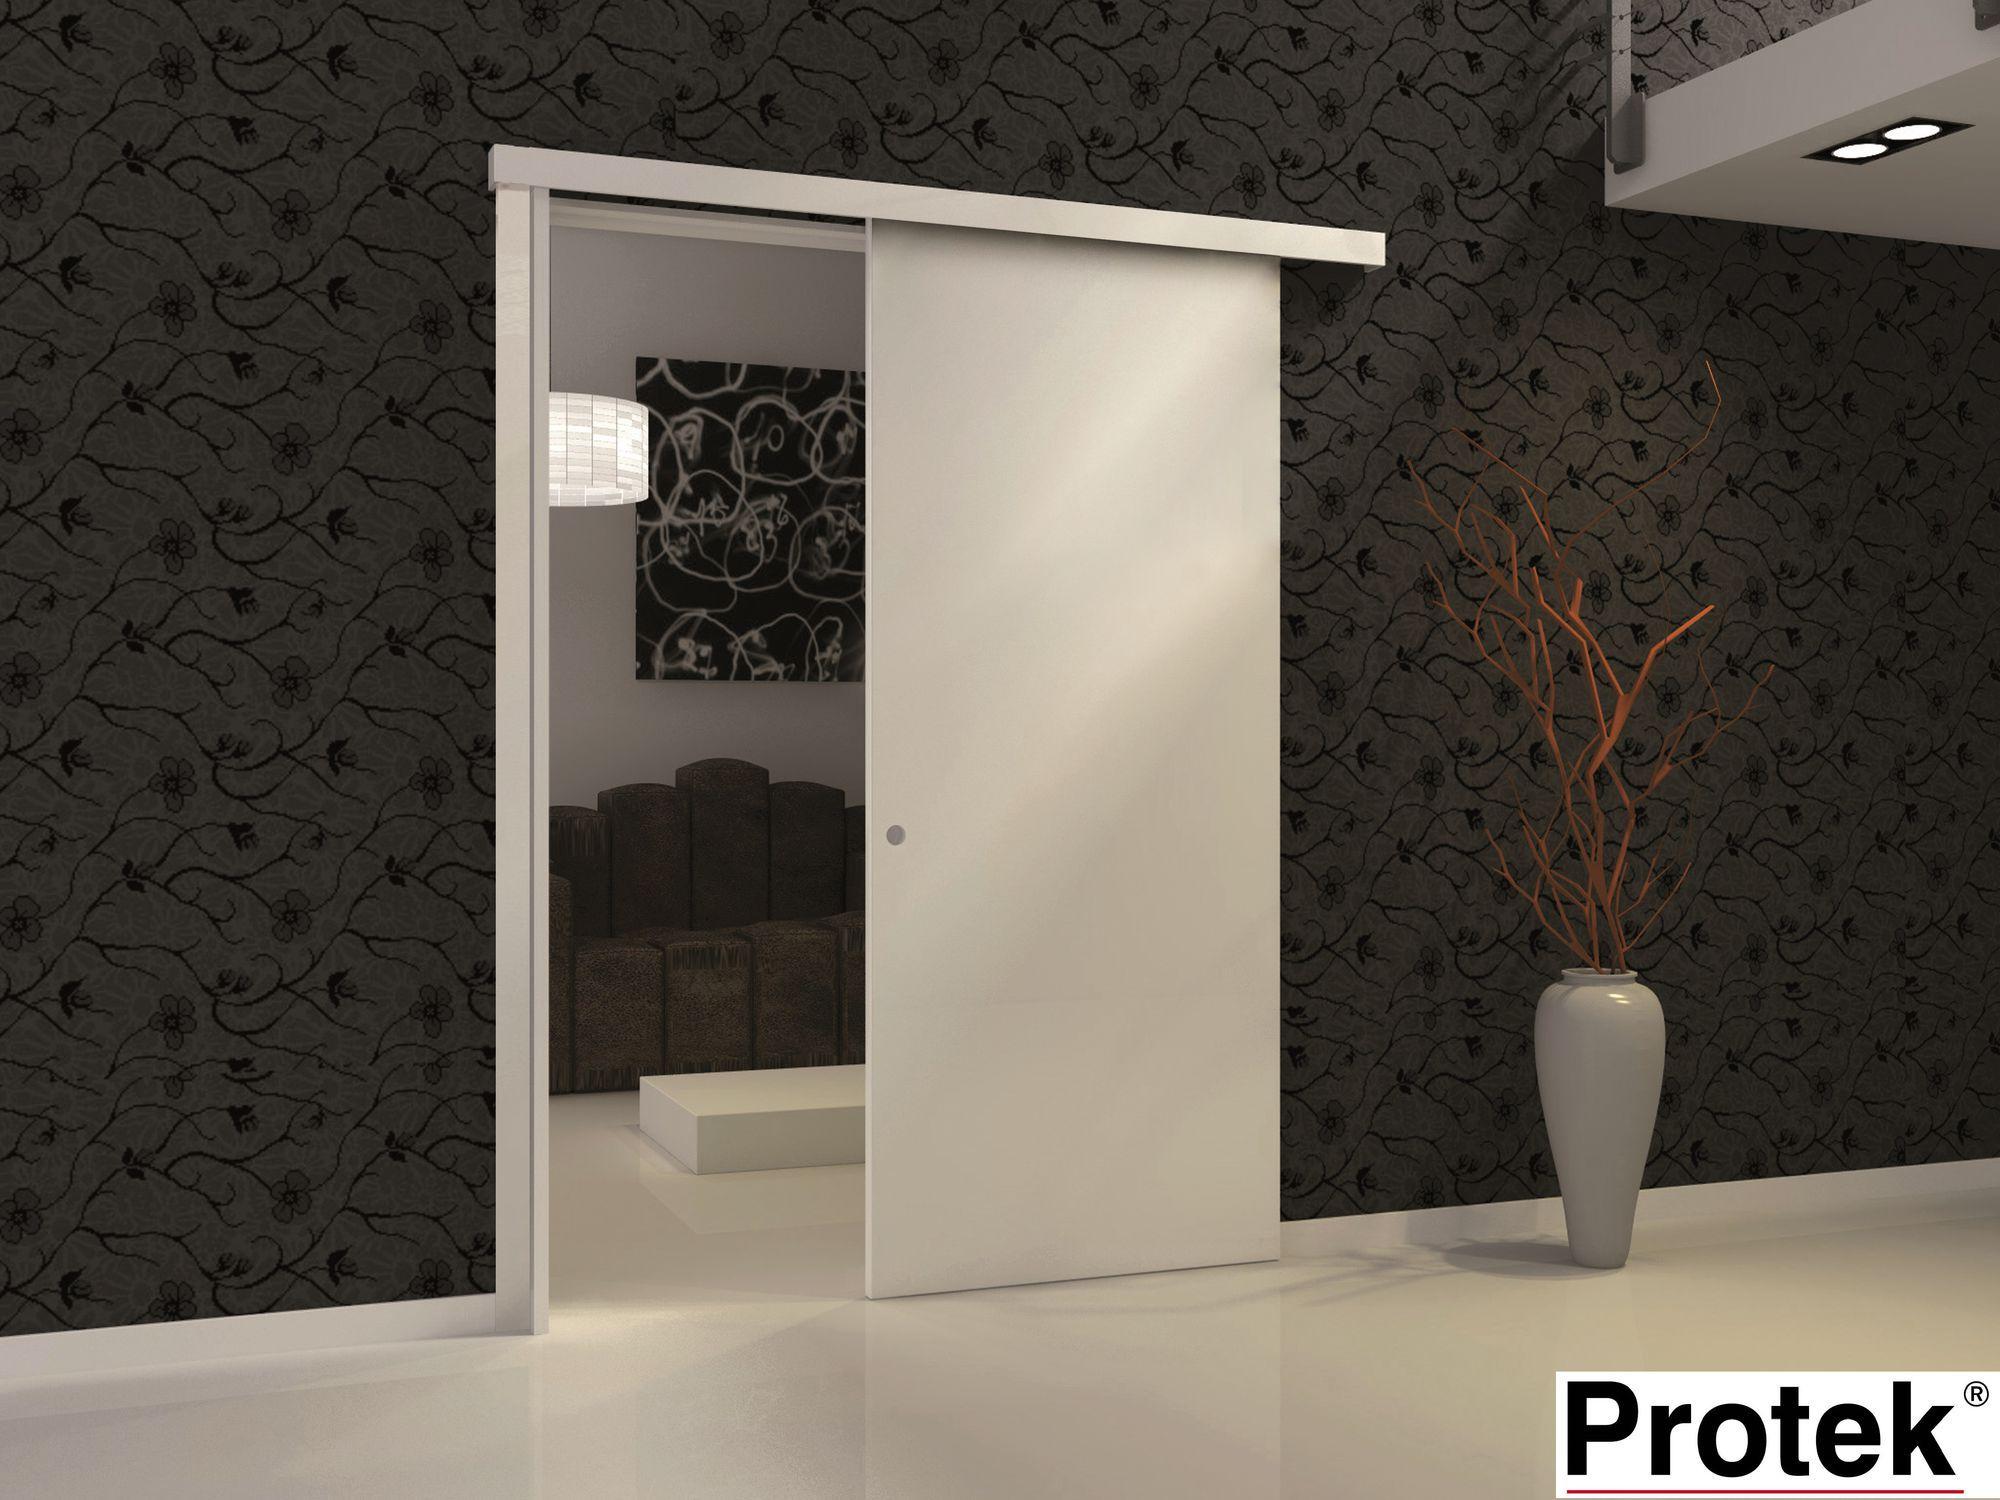 Metal fastening system for doors sliding woody protek metal fastening system for doors sliding woody protek vtopaller Gallery